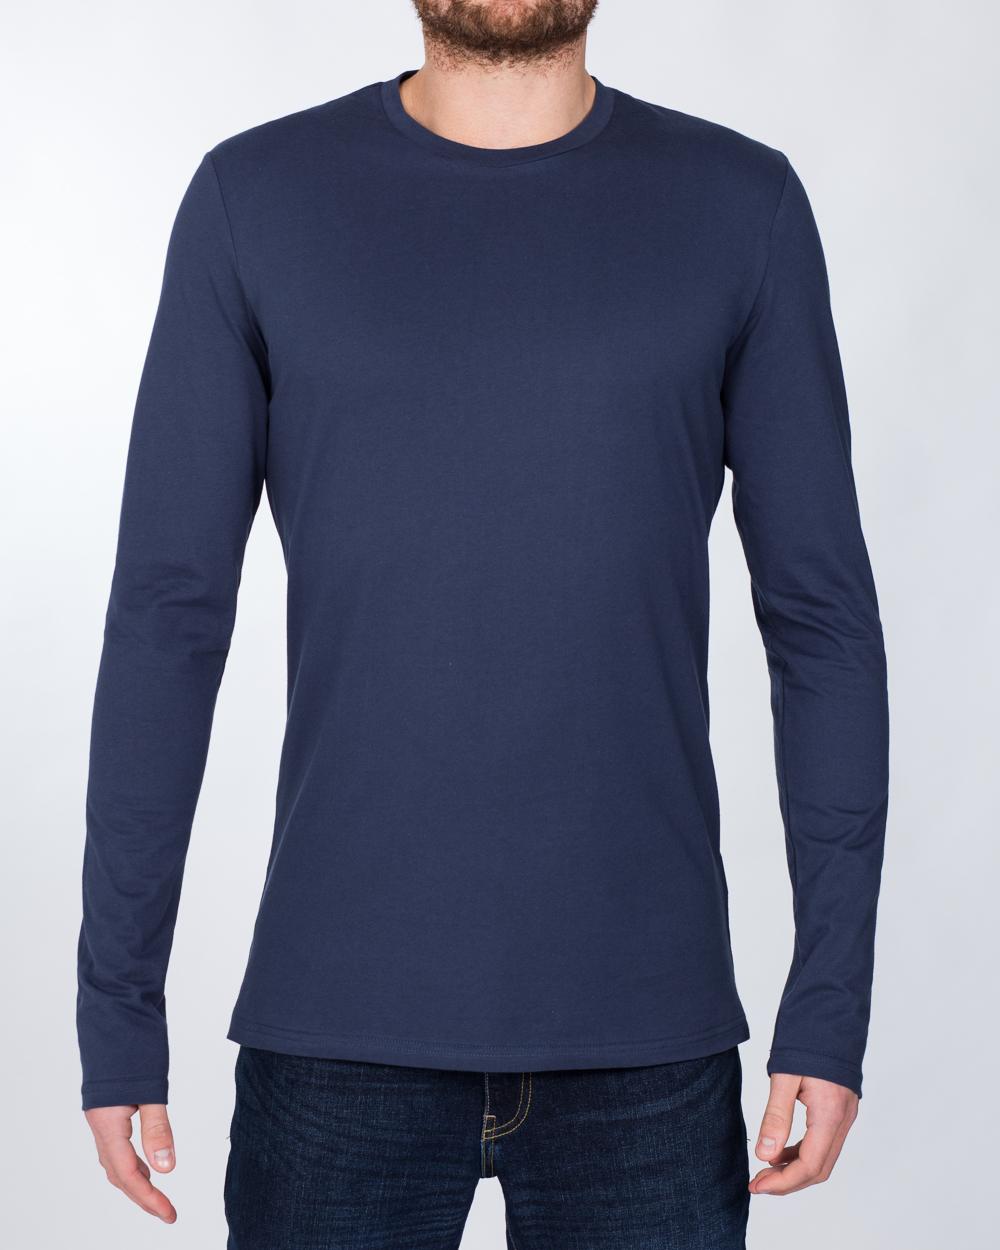 2t Tall Long Sleeve T-Shirt (navy)